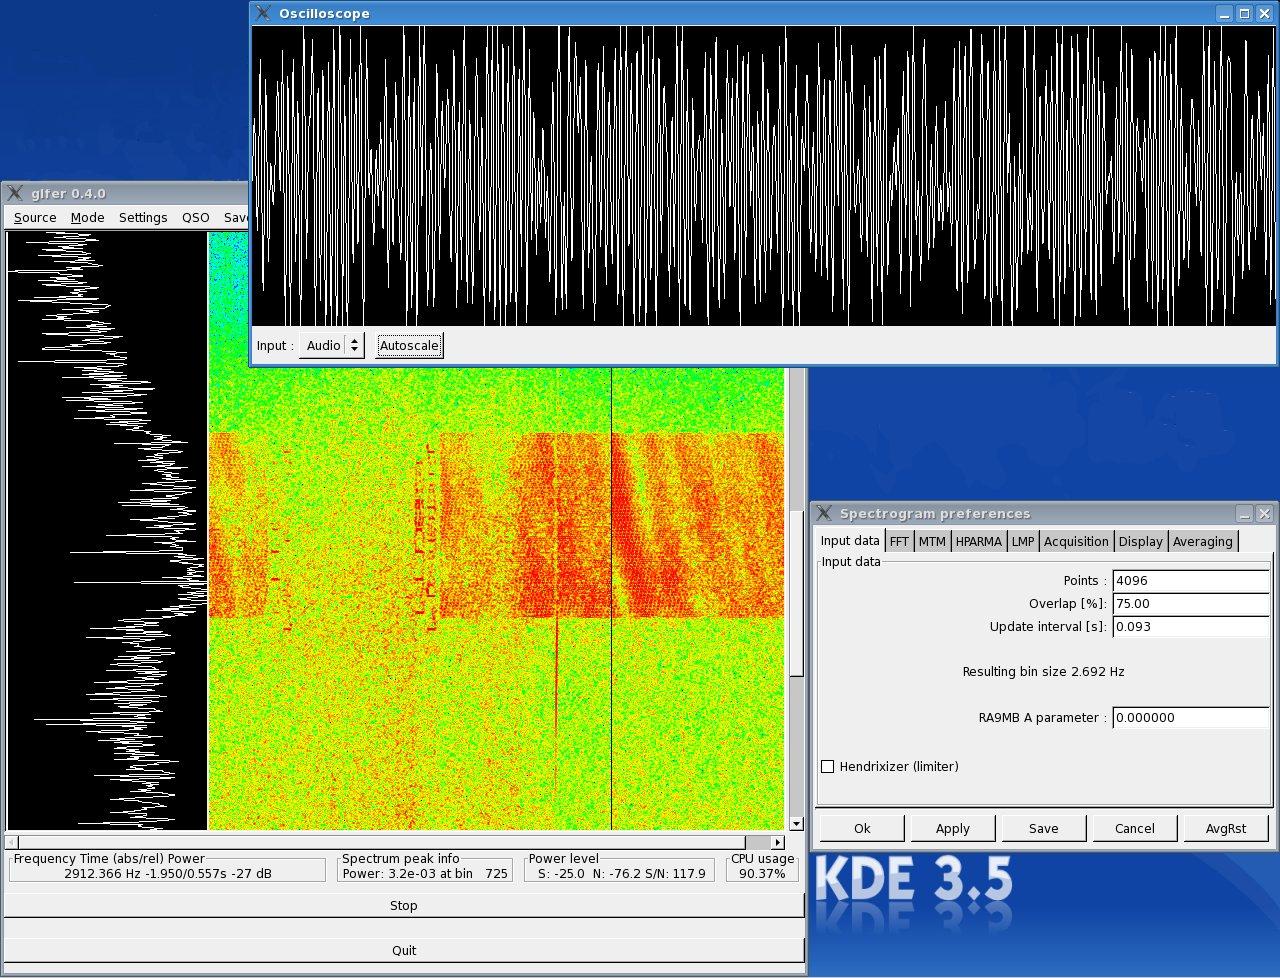 glfer - a Linux spectrogram viewer and QRSS/DFCW transmitter